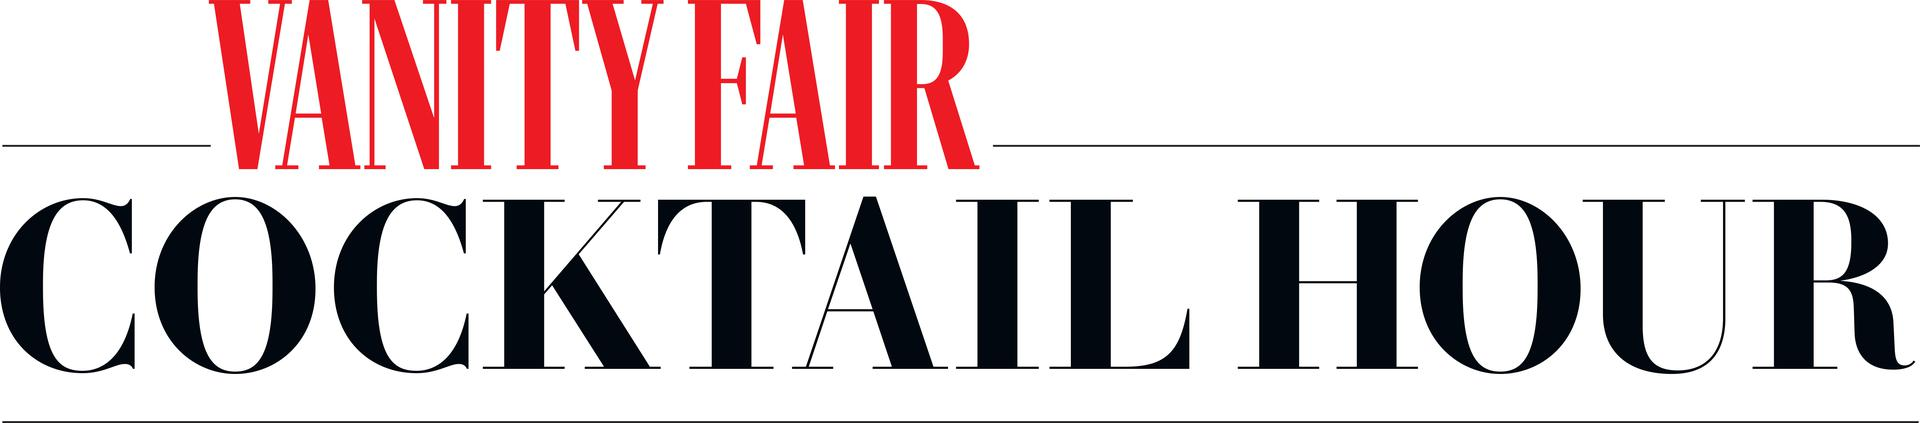 Vanity Fair's Cocktail Hour logo image